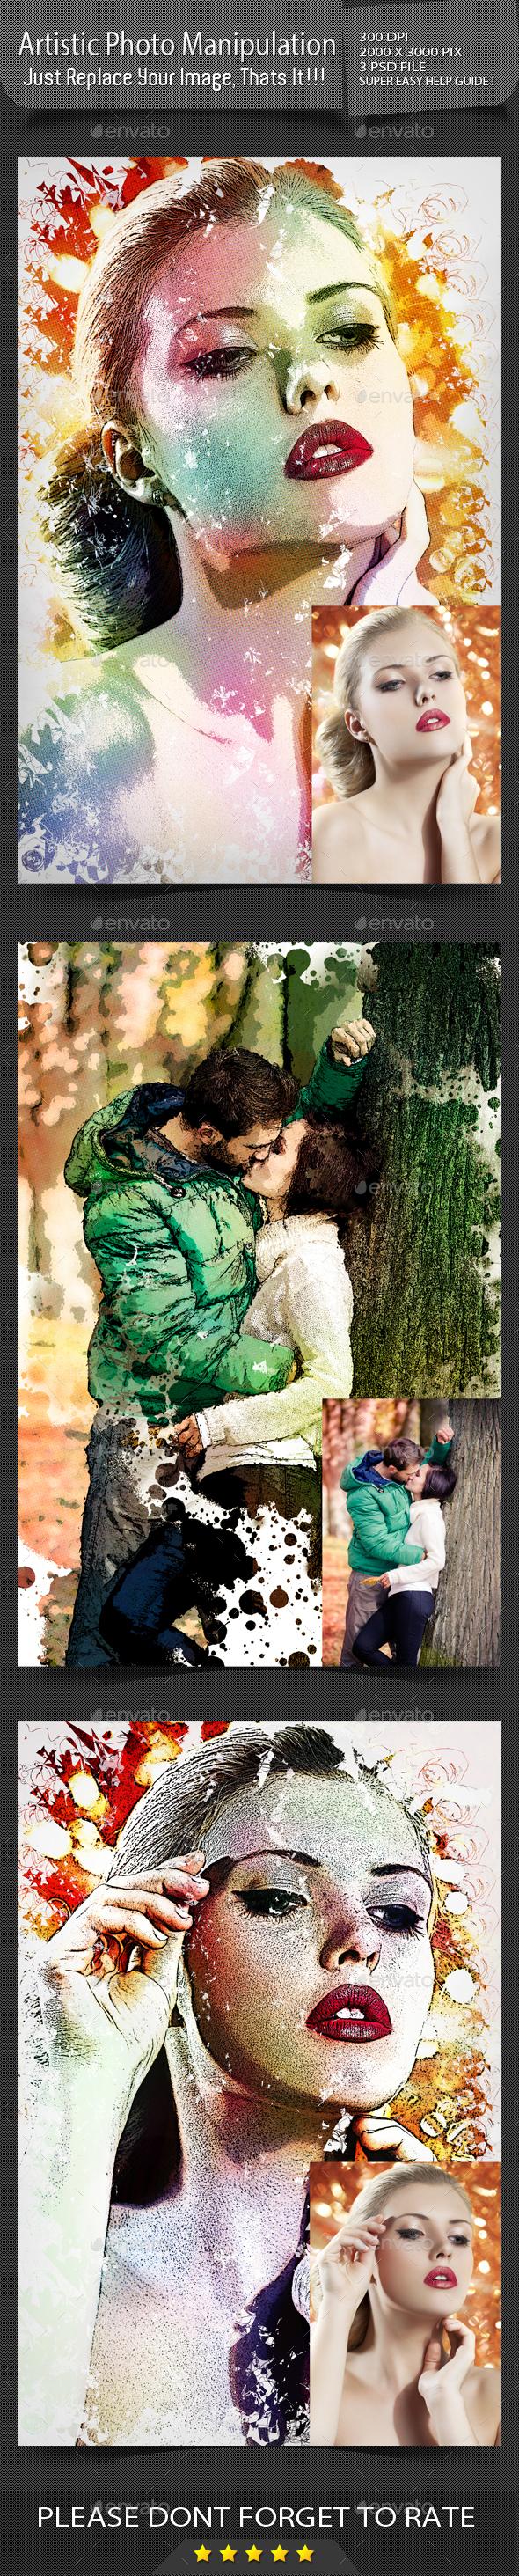 Artistic Photo Manuplation - Artistic Photo Templates